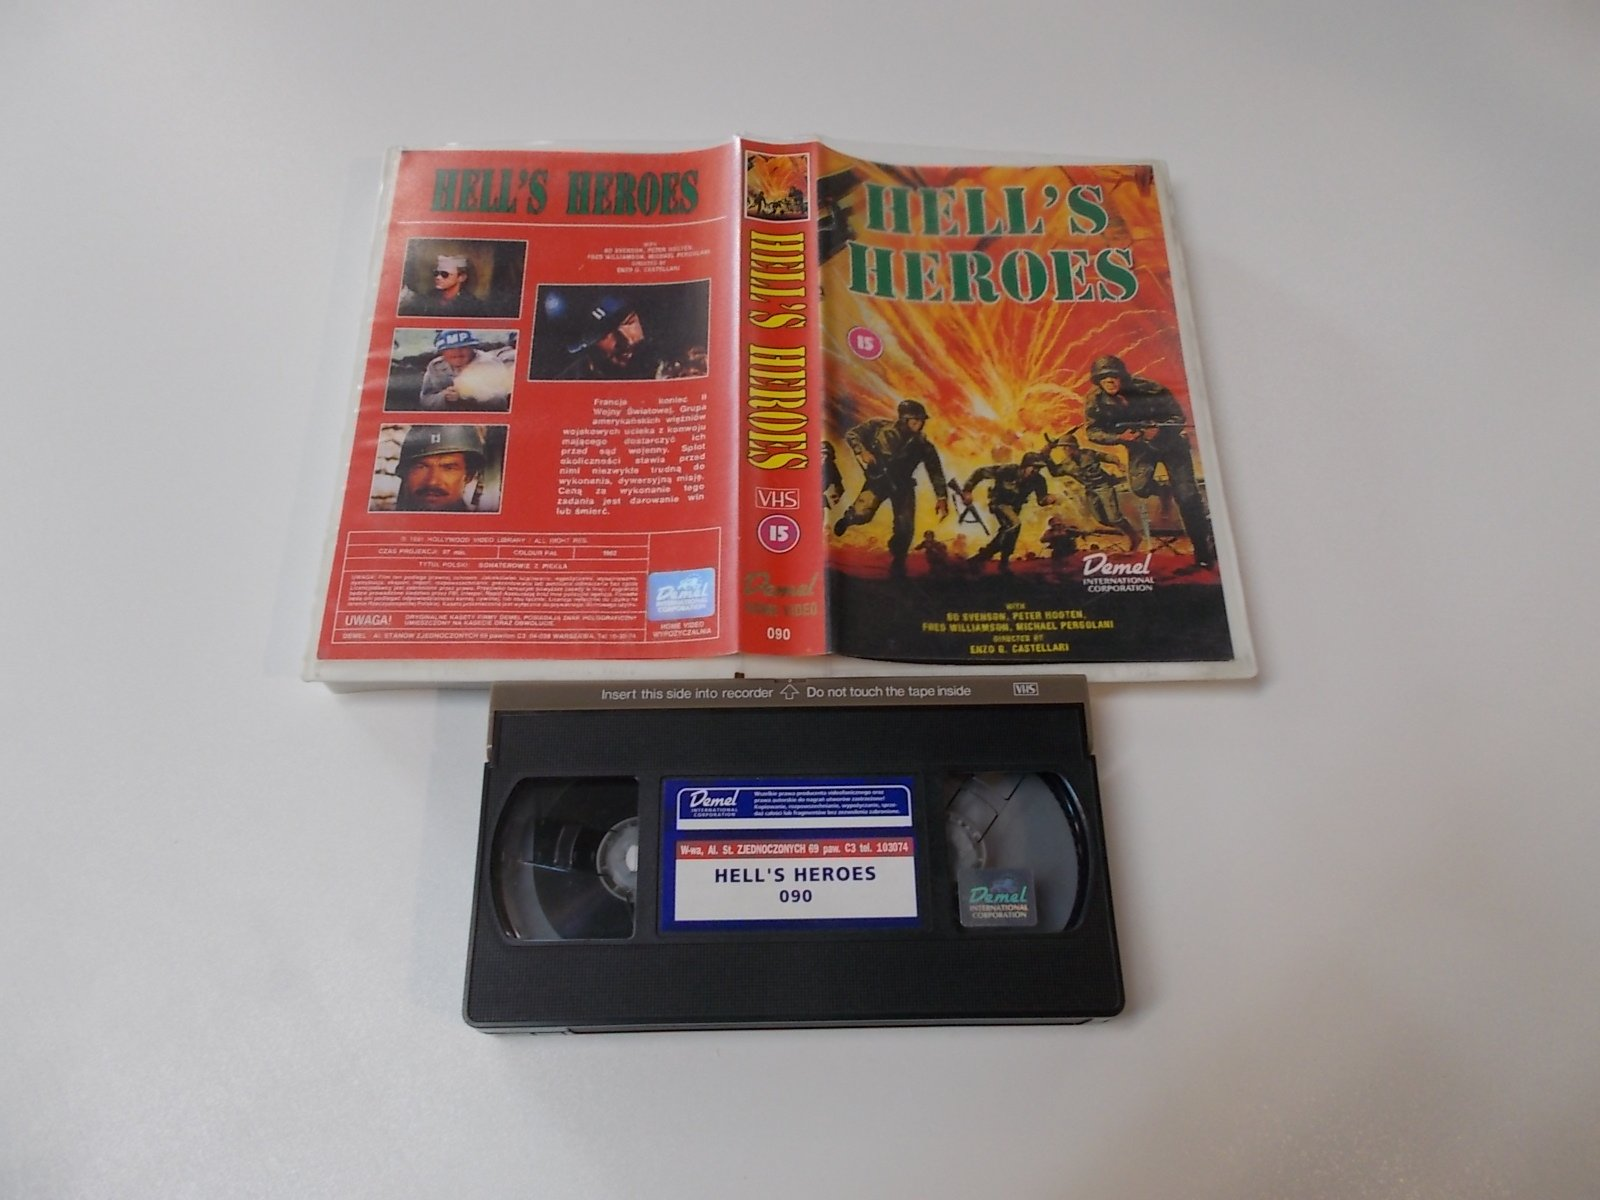 HELL'S HEROES - VHS Kaseta Video - Opole 1659